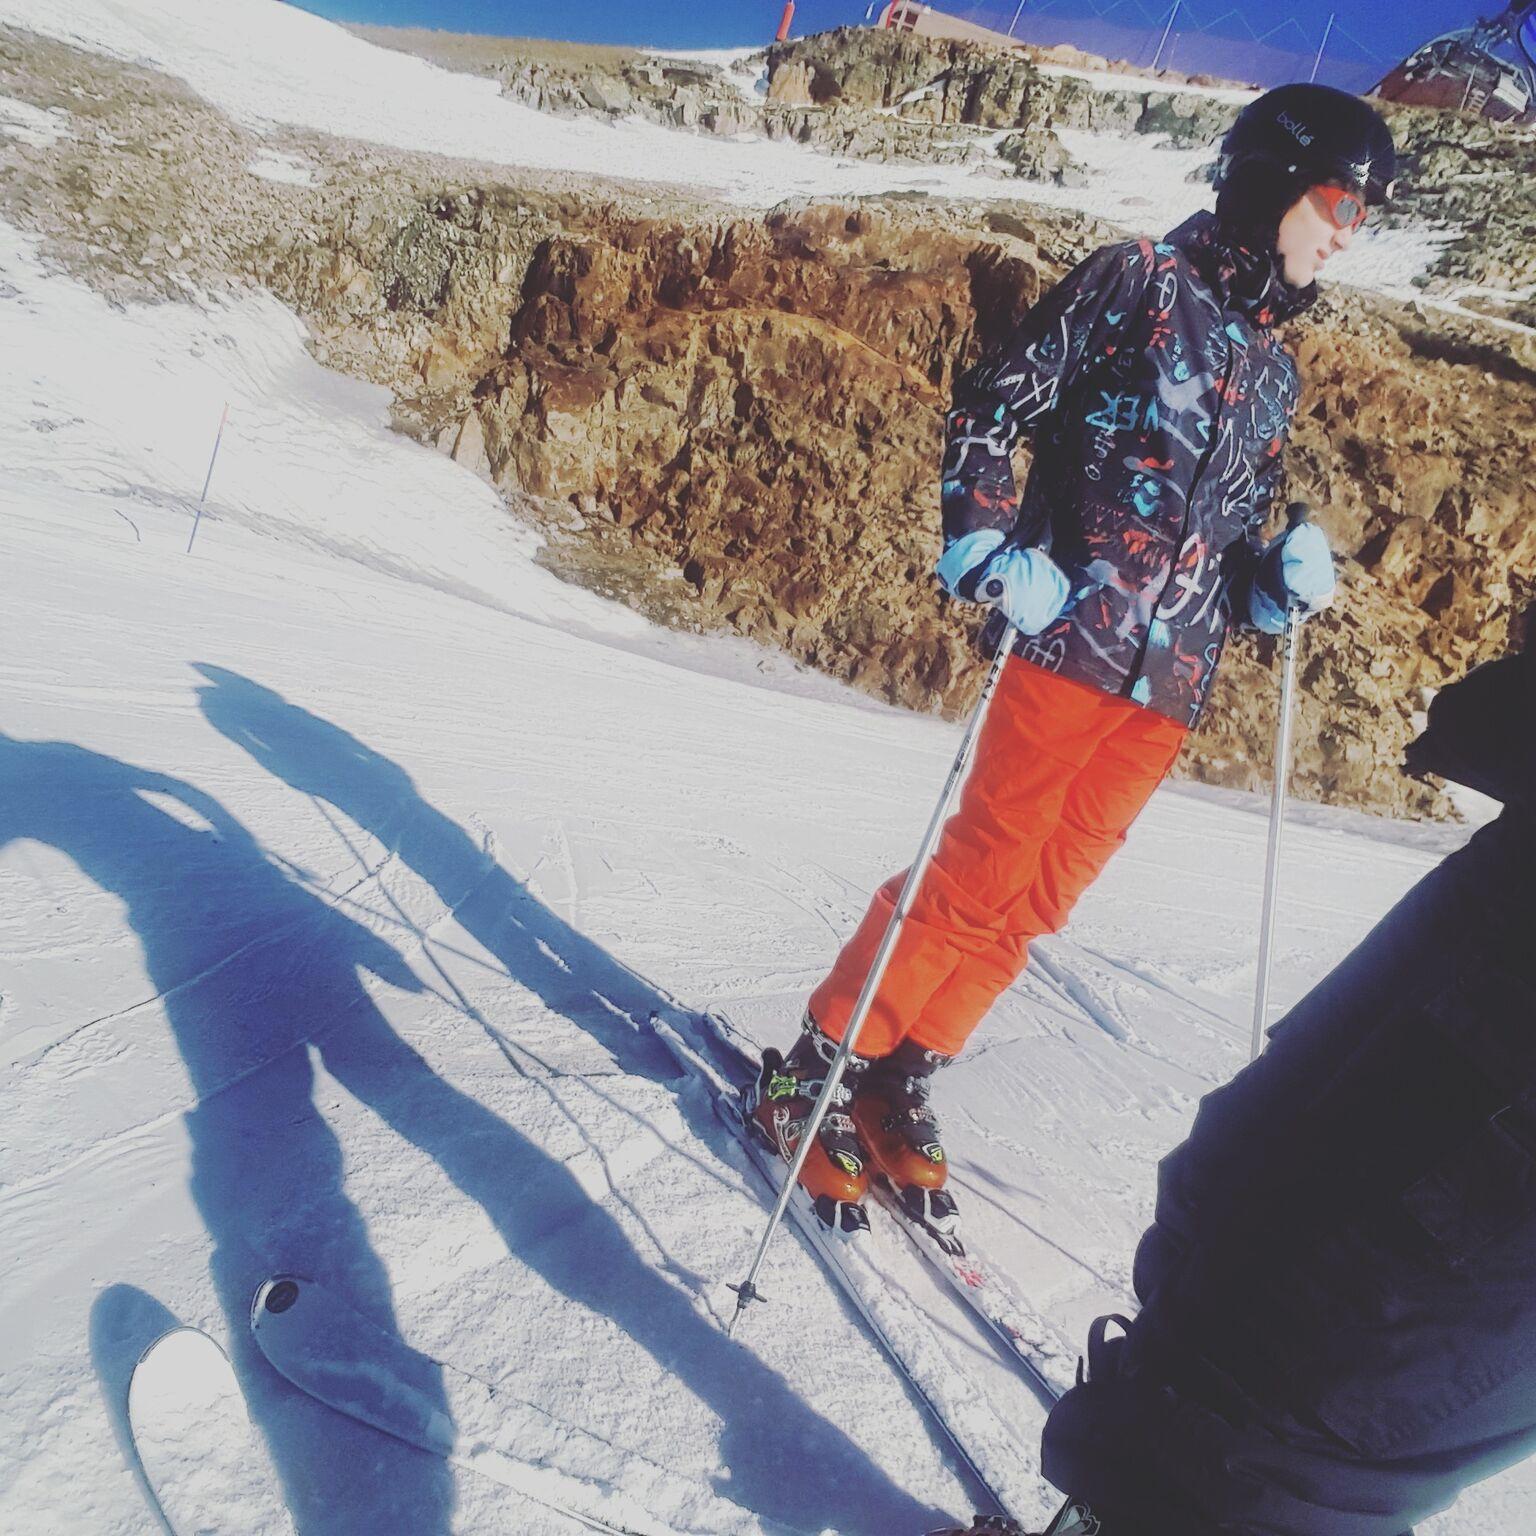 J'ai skié grâce à Skimium